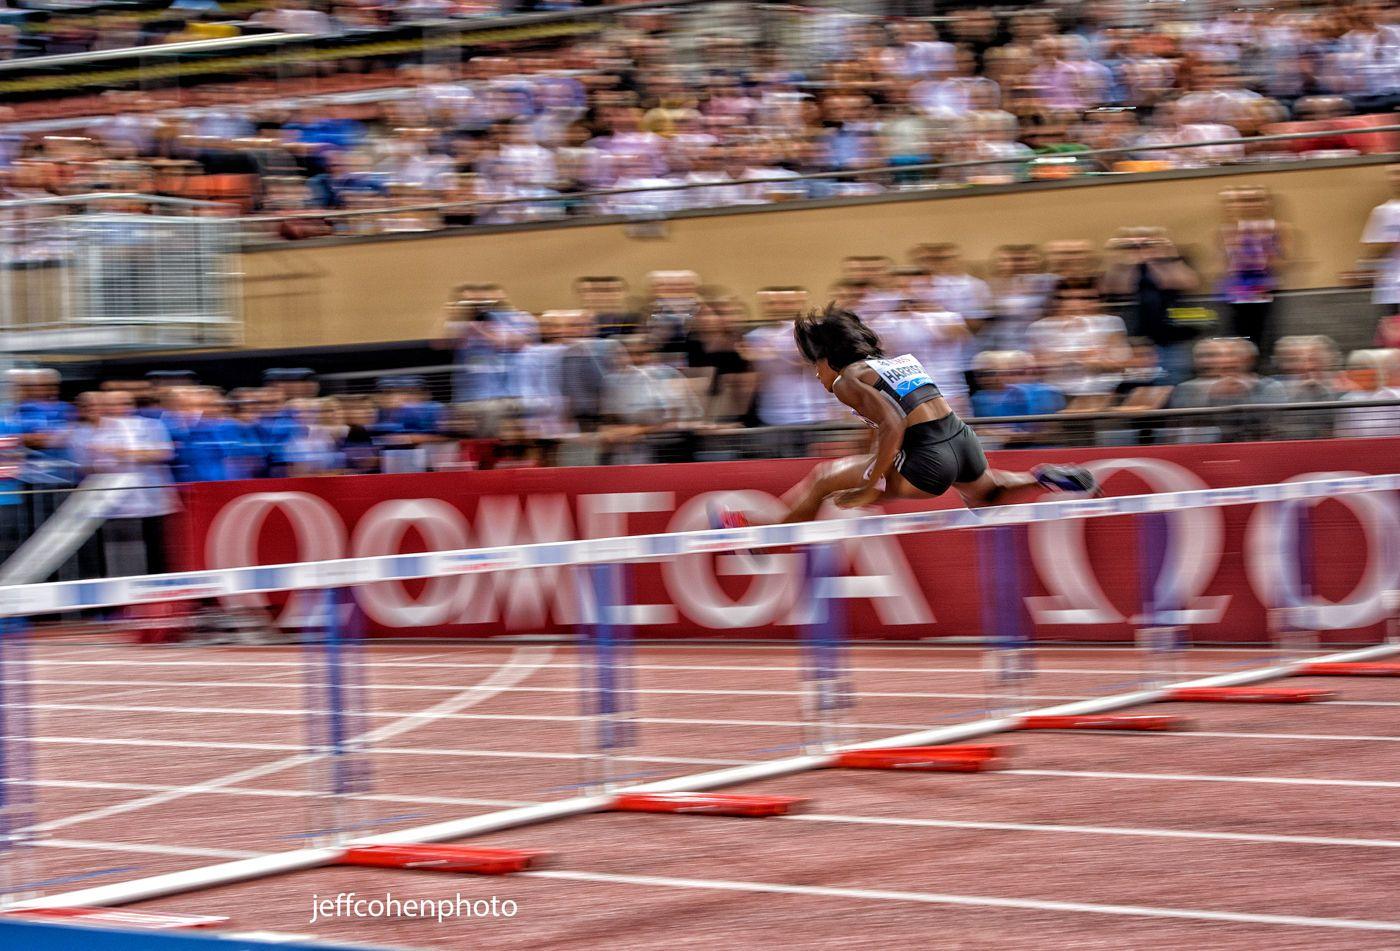 1r2016_athletissima_lausanne_k_harrison_100mh_jeff_cohen_photo_1340_web.jpg